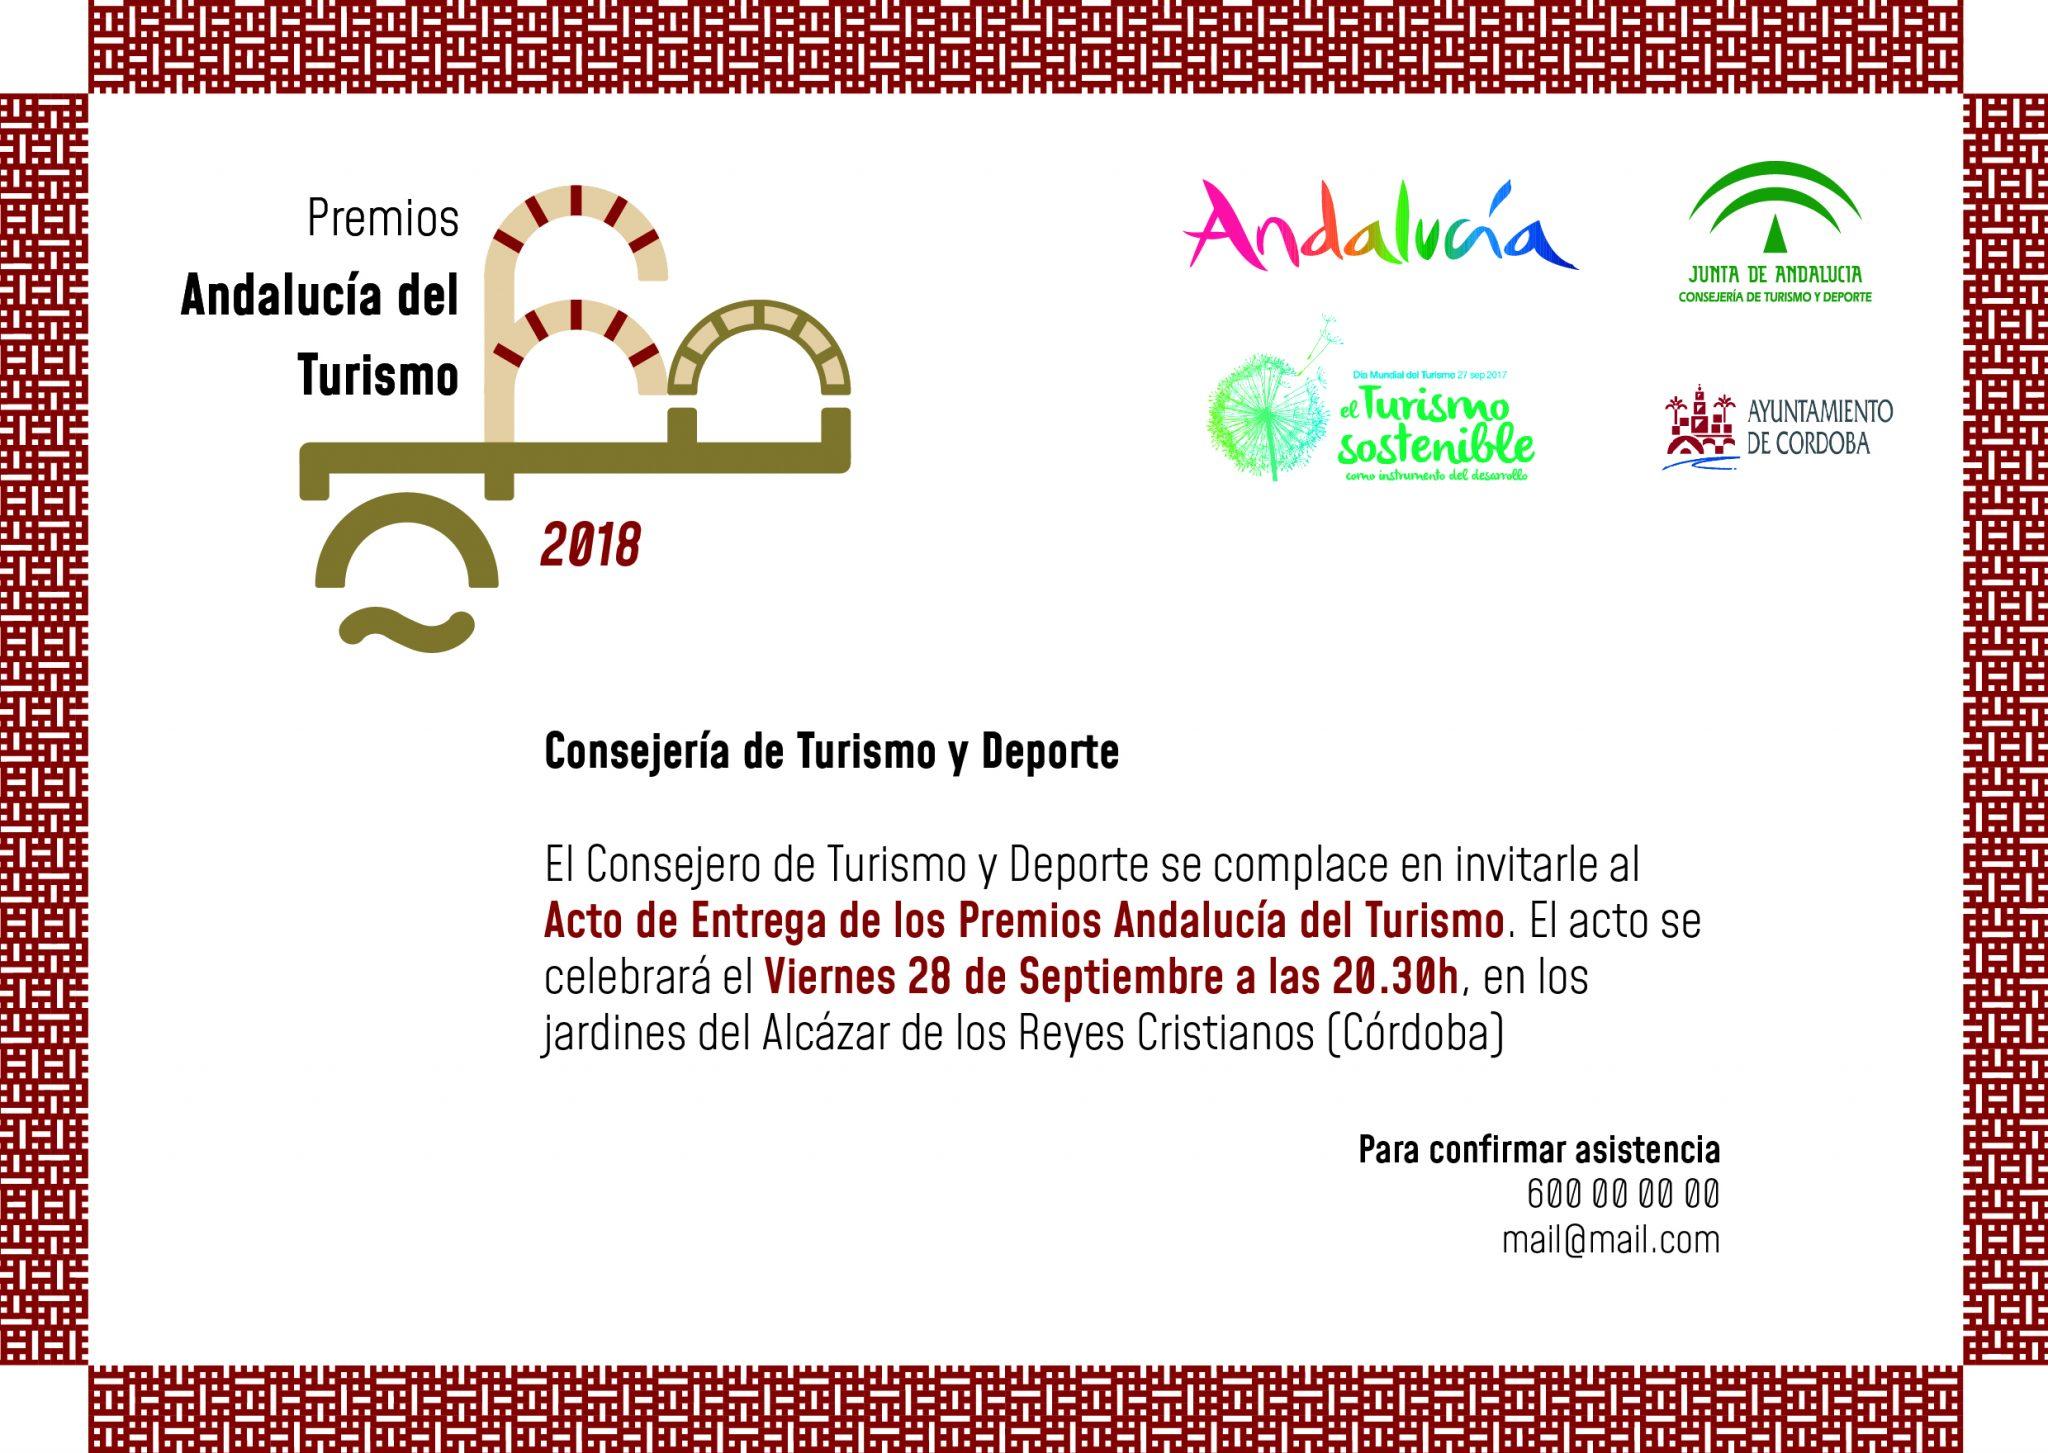 Invitación Premios Andalucía Turismo 18